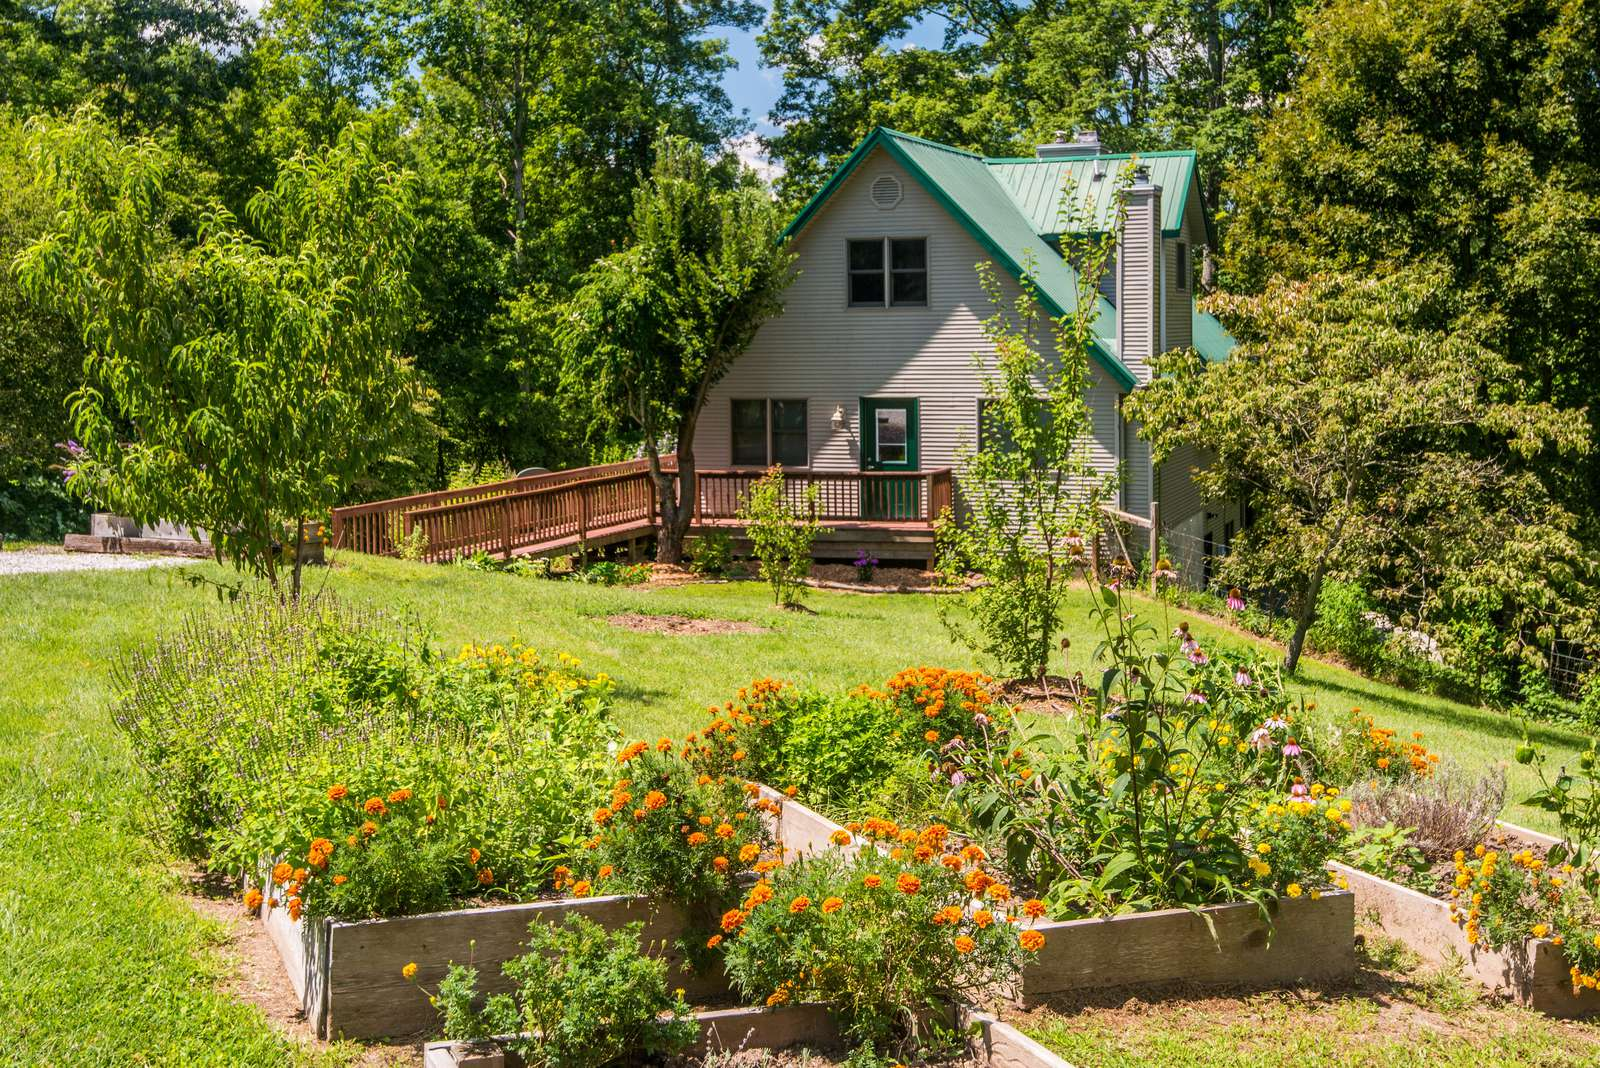 Chanterelle Chalet Cabin - property